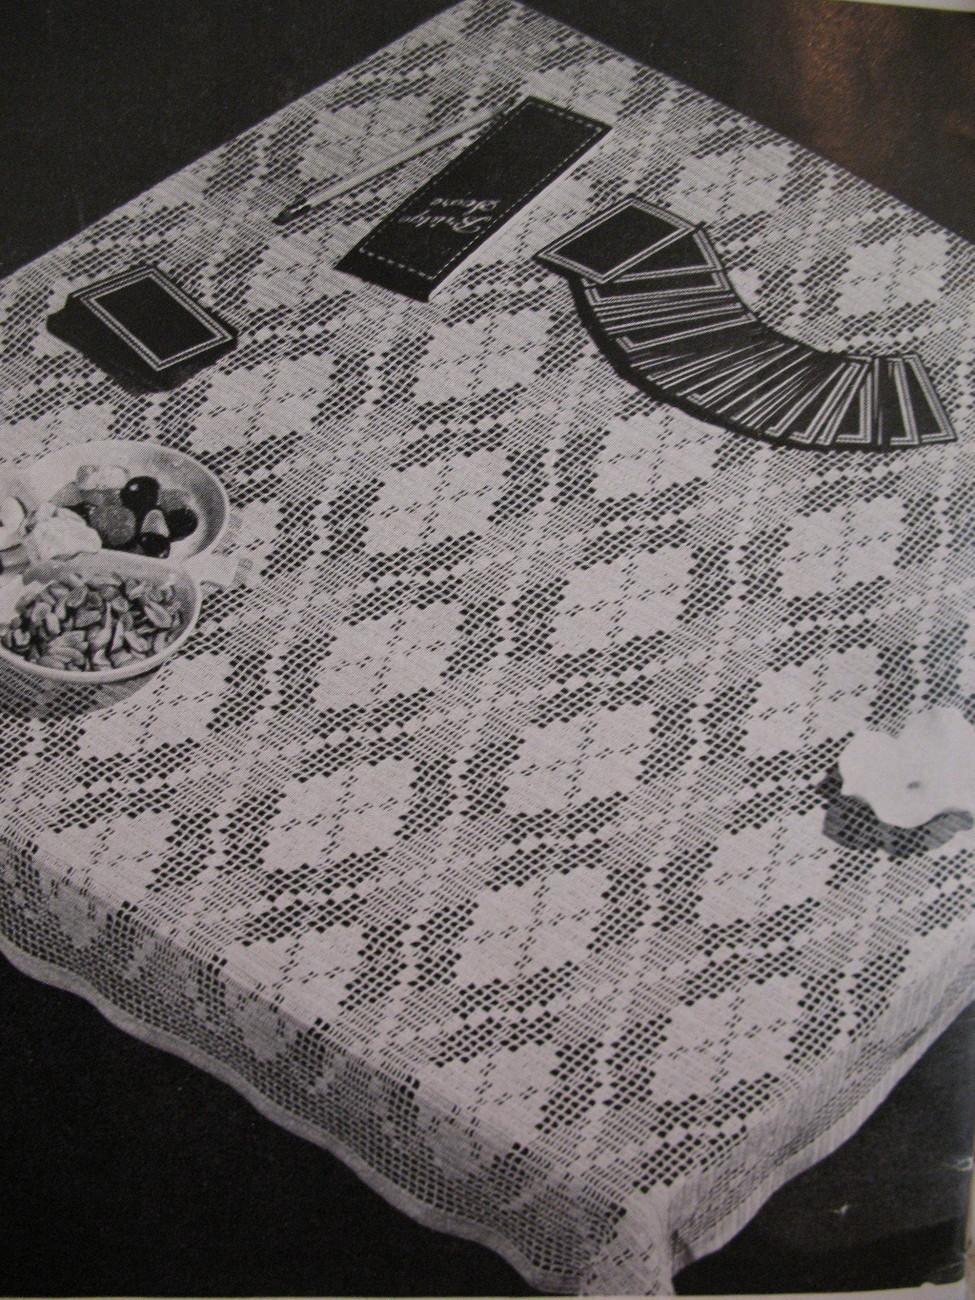 Vintage 1948 Crochet Tablecloth Pattern Booklet